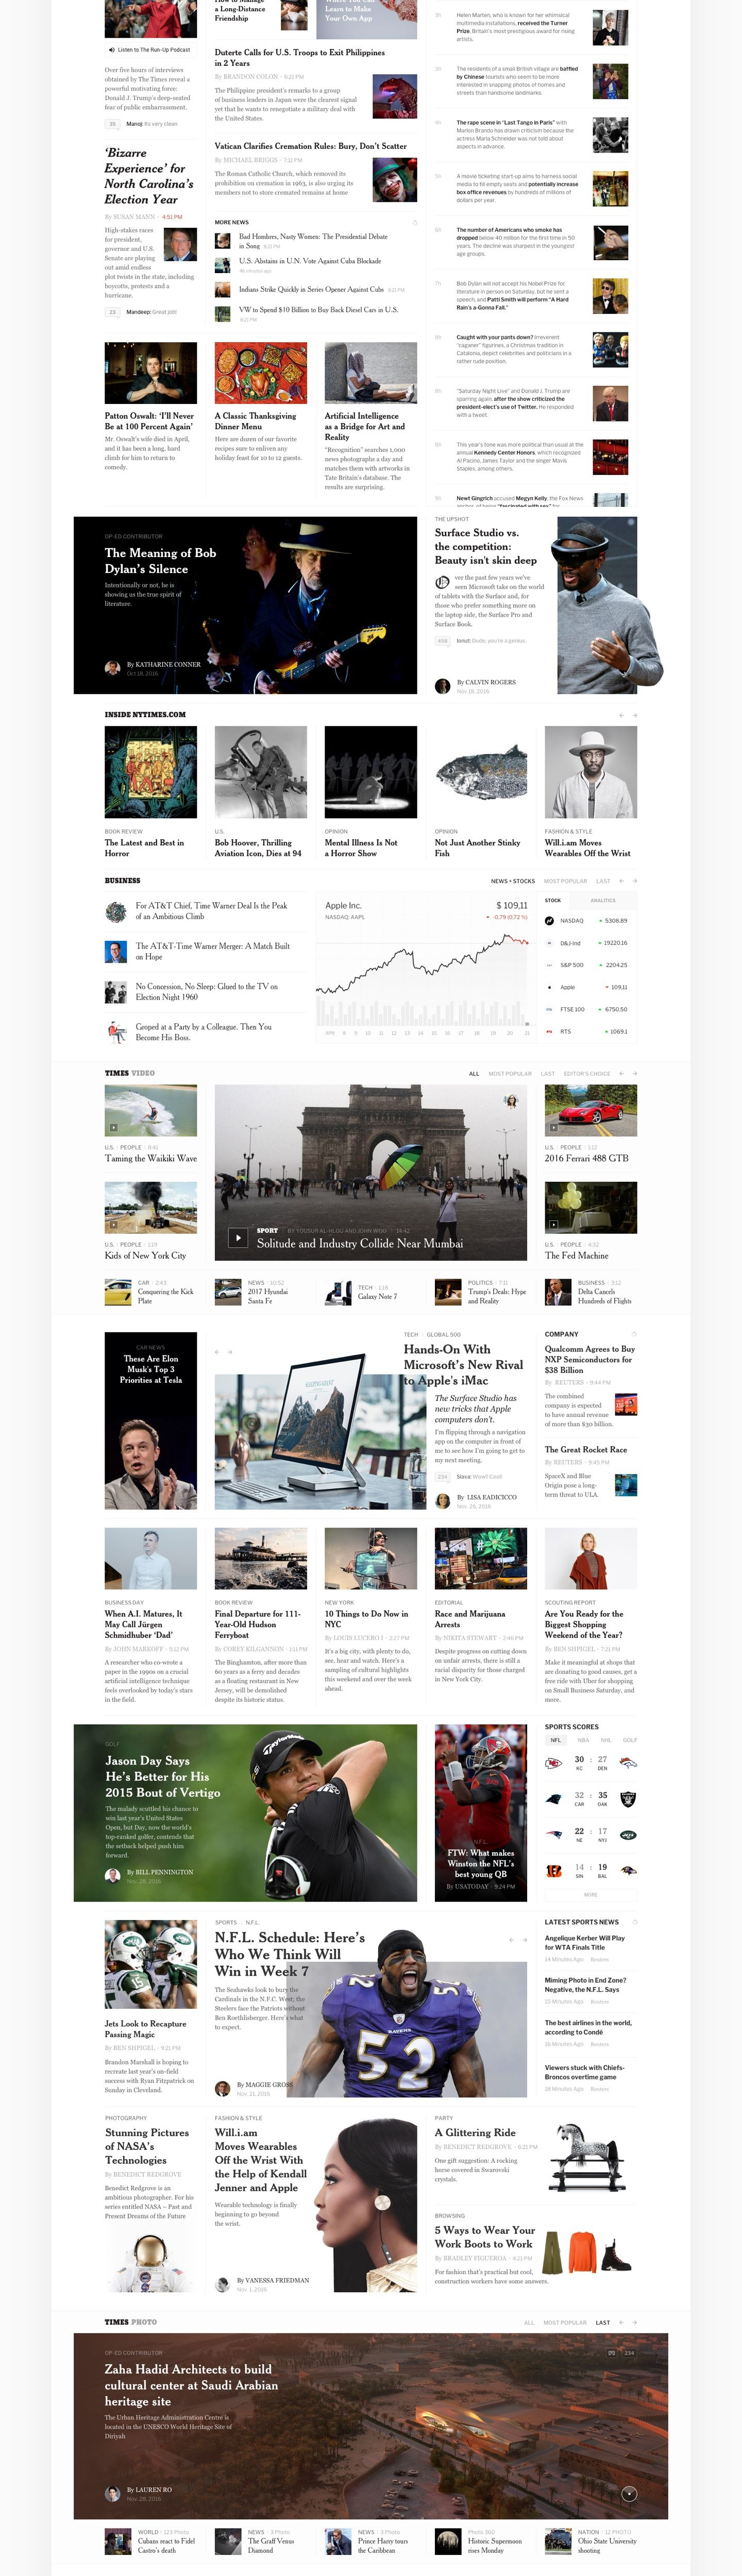 Editorial Design The New York Times Redesign Concept Business Web Design Web Design Logo News Web Design